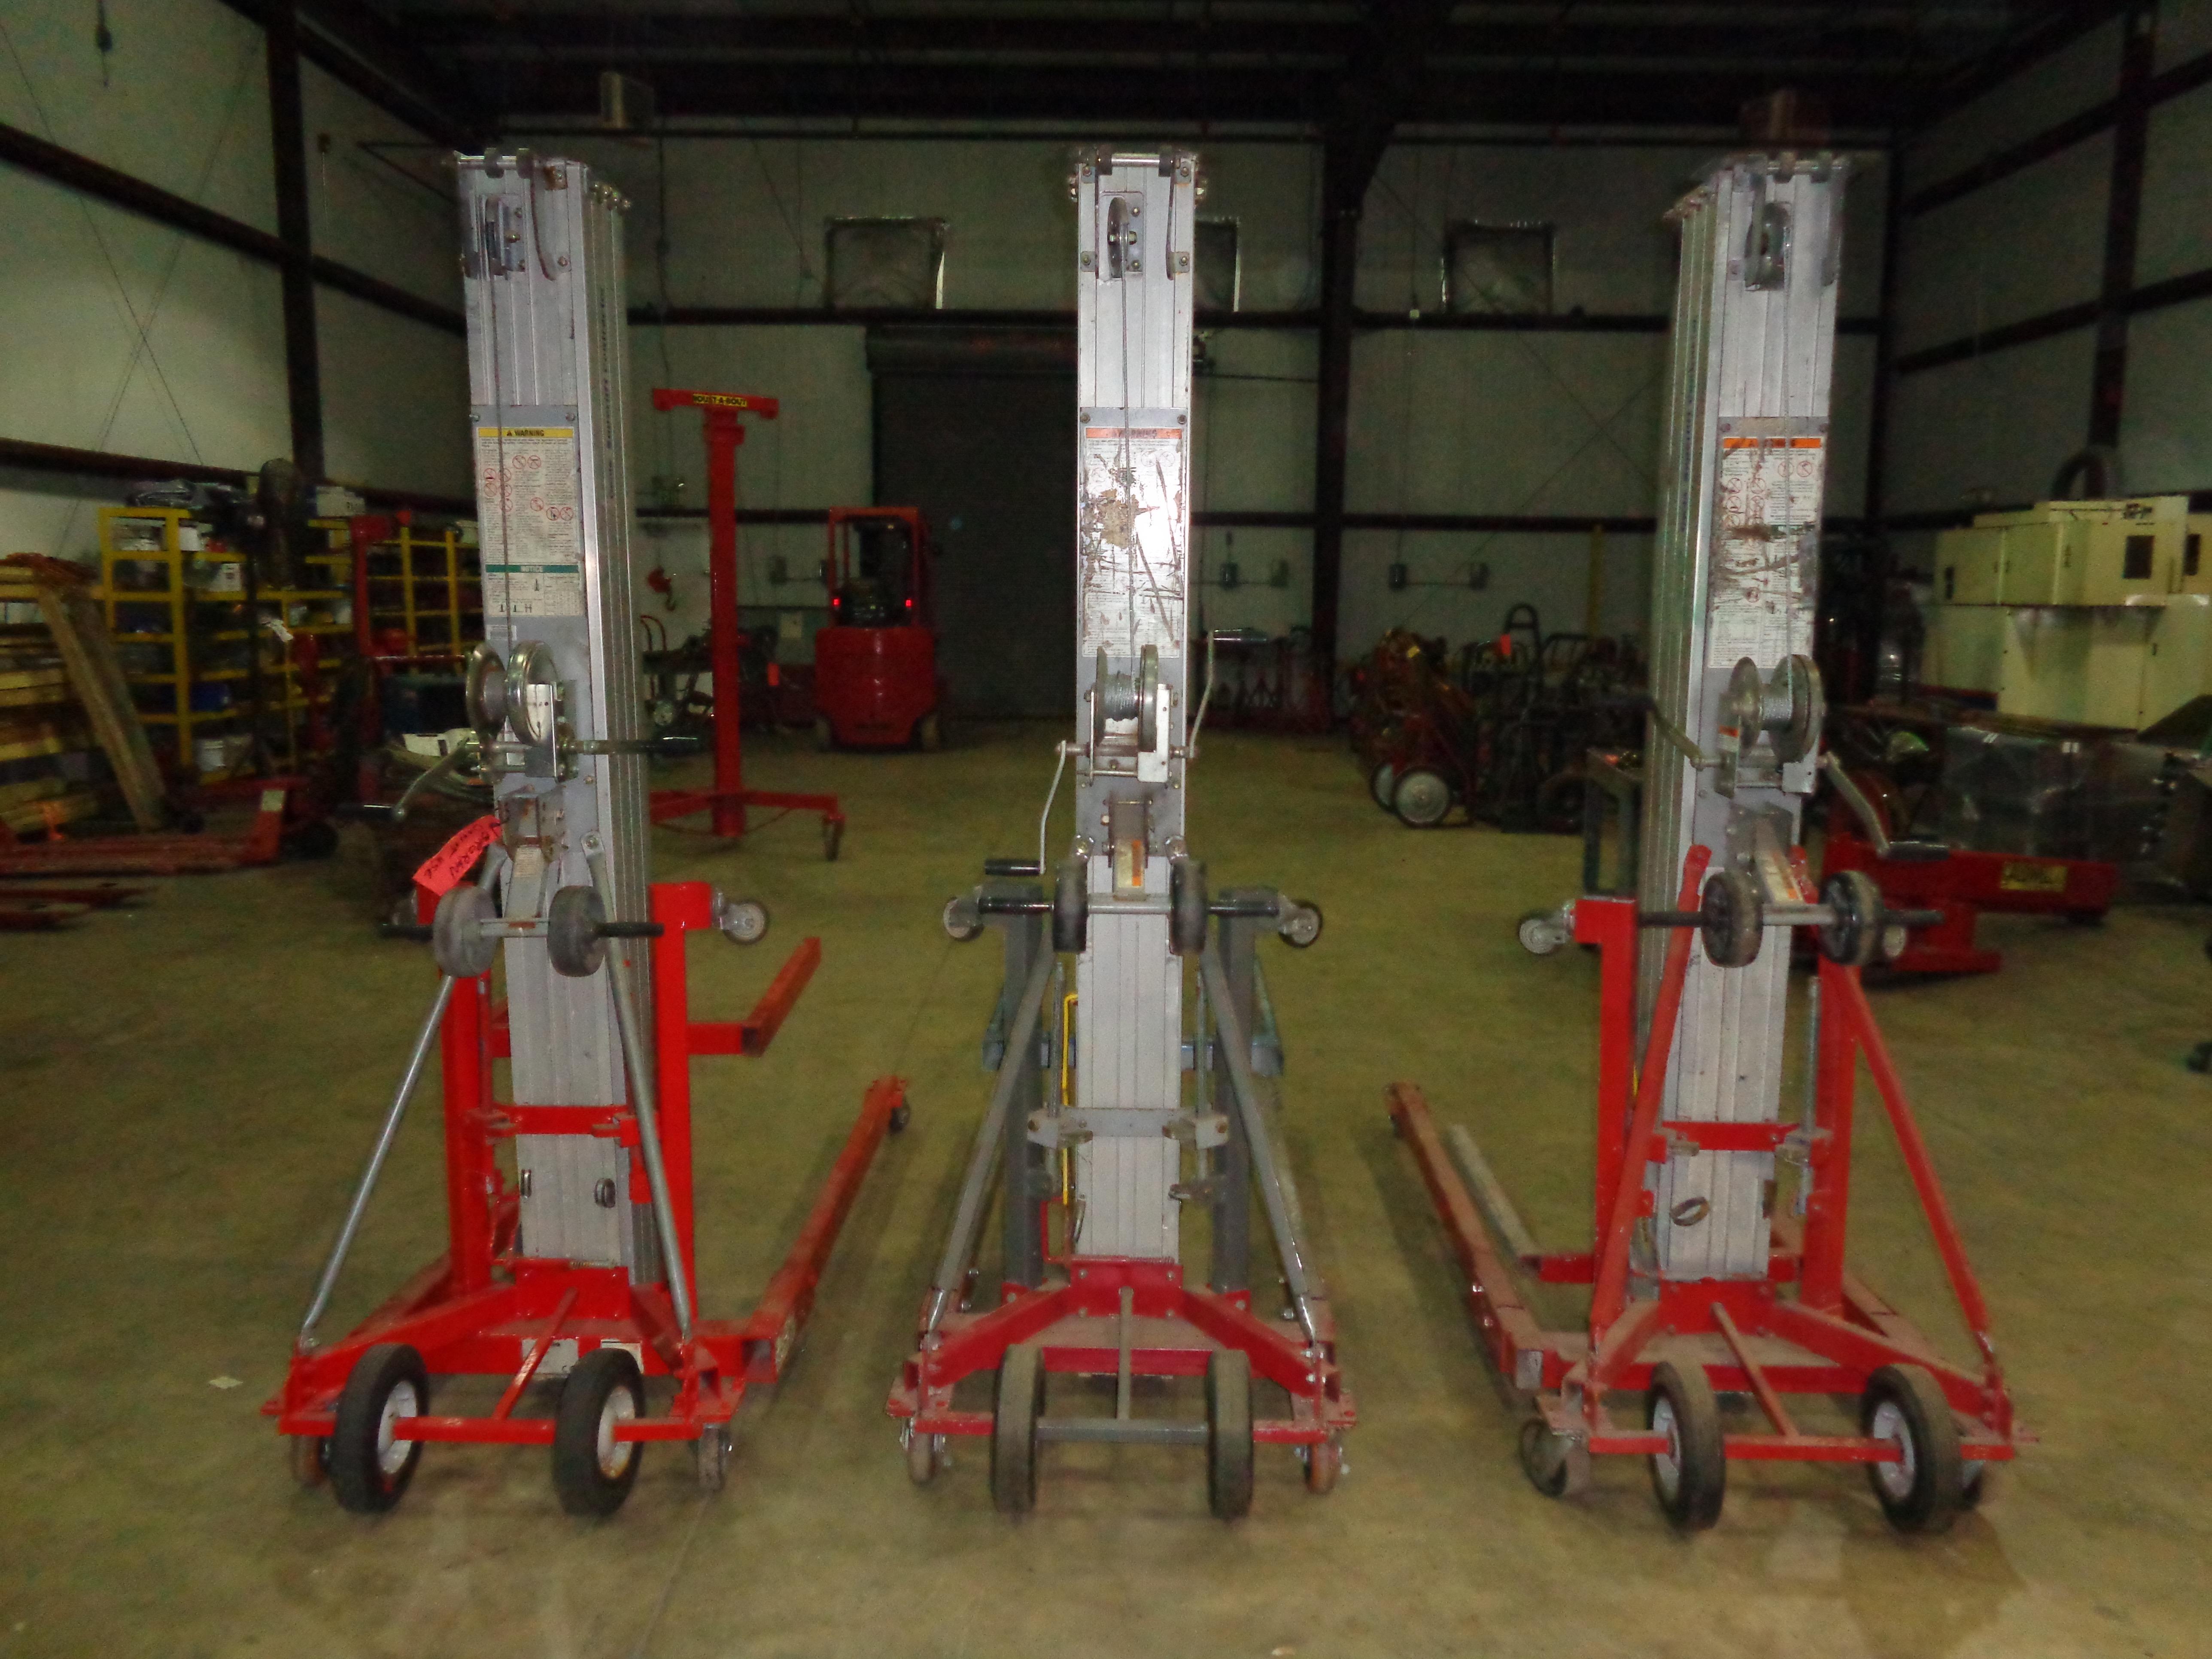 Lot of 3 Genie SLC-24 Duct Lifts